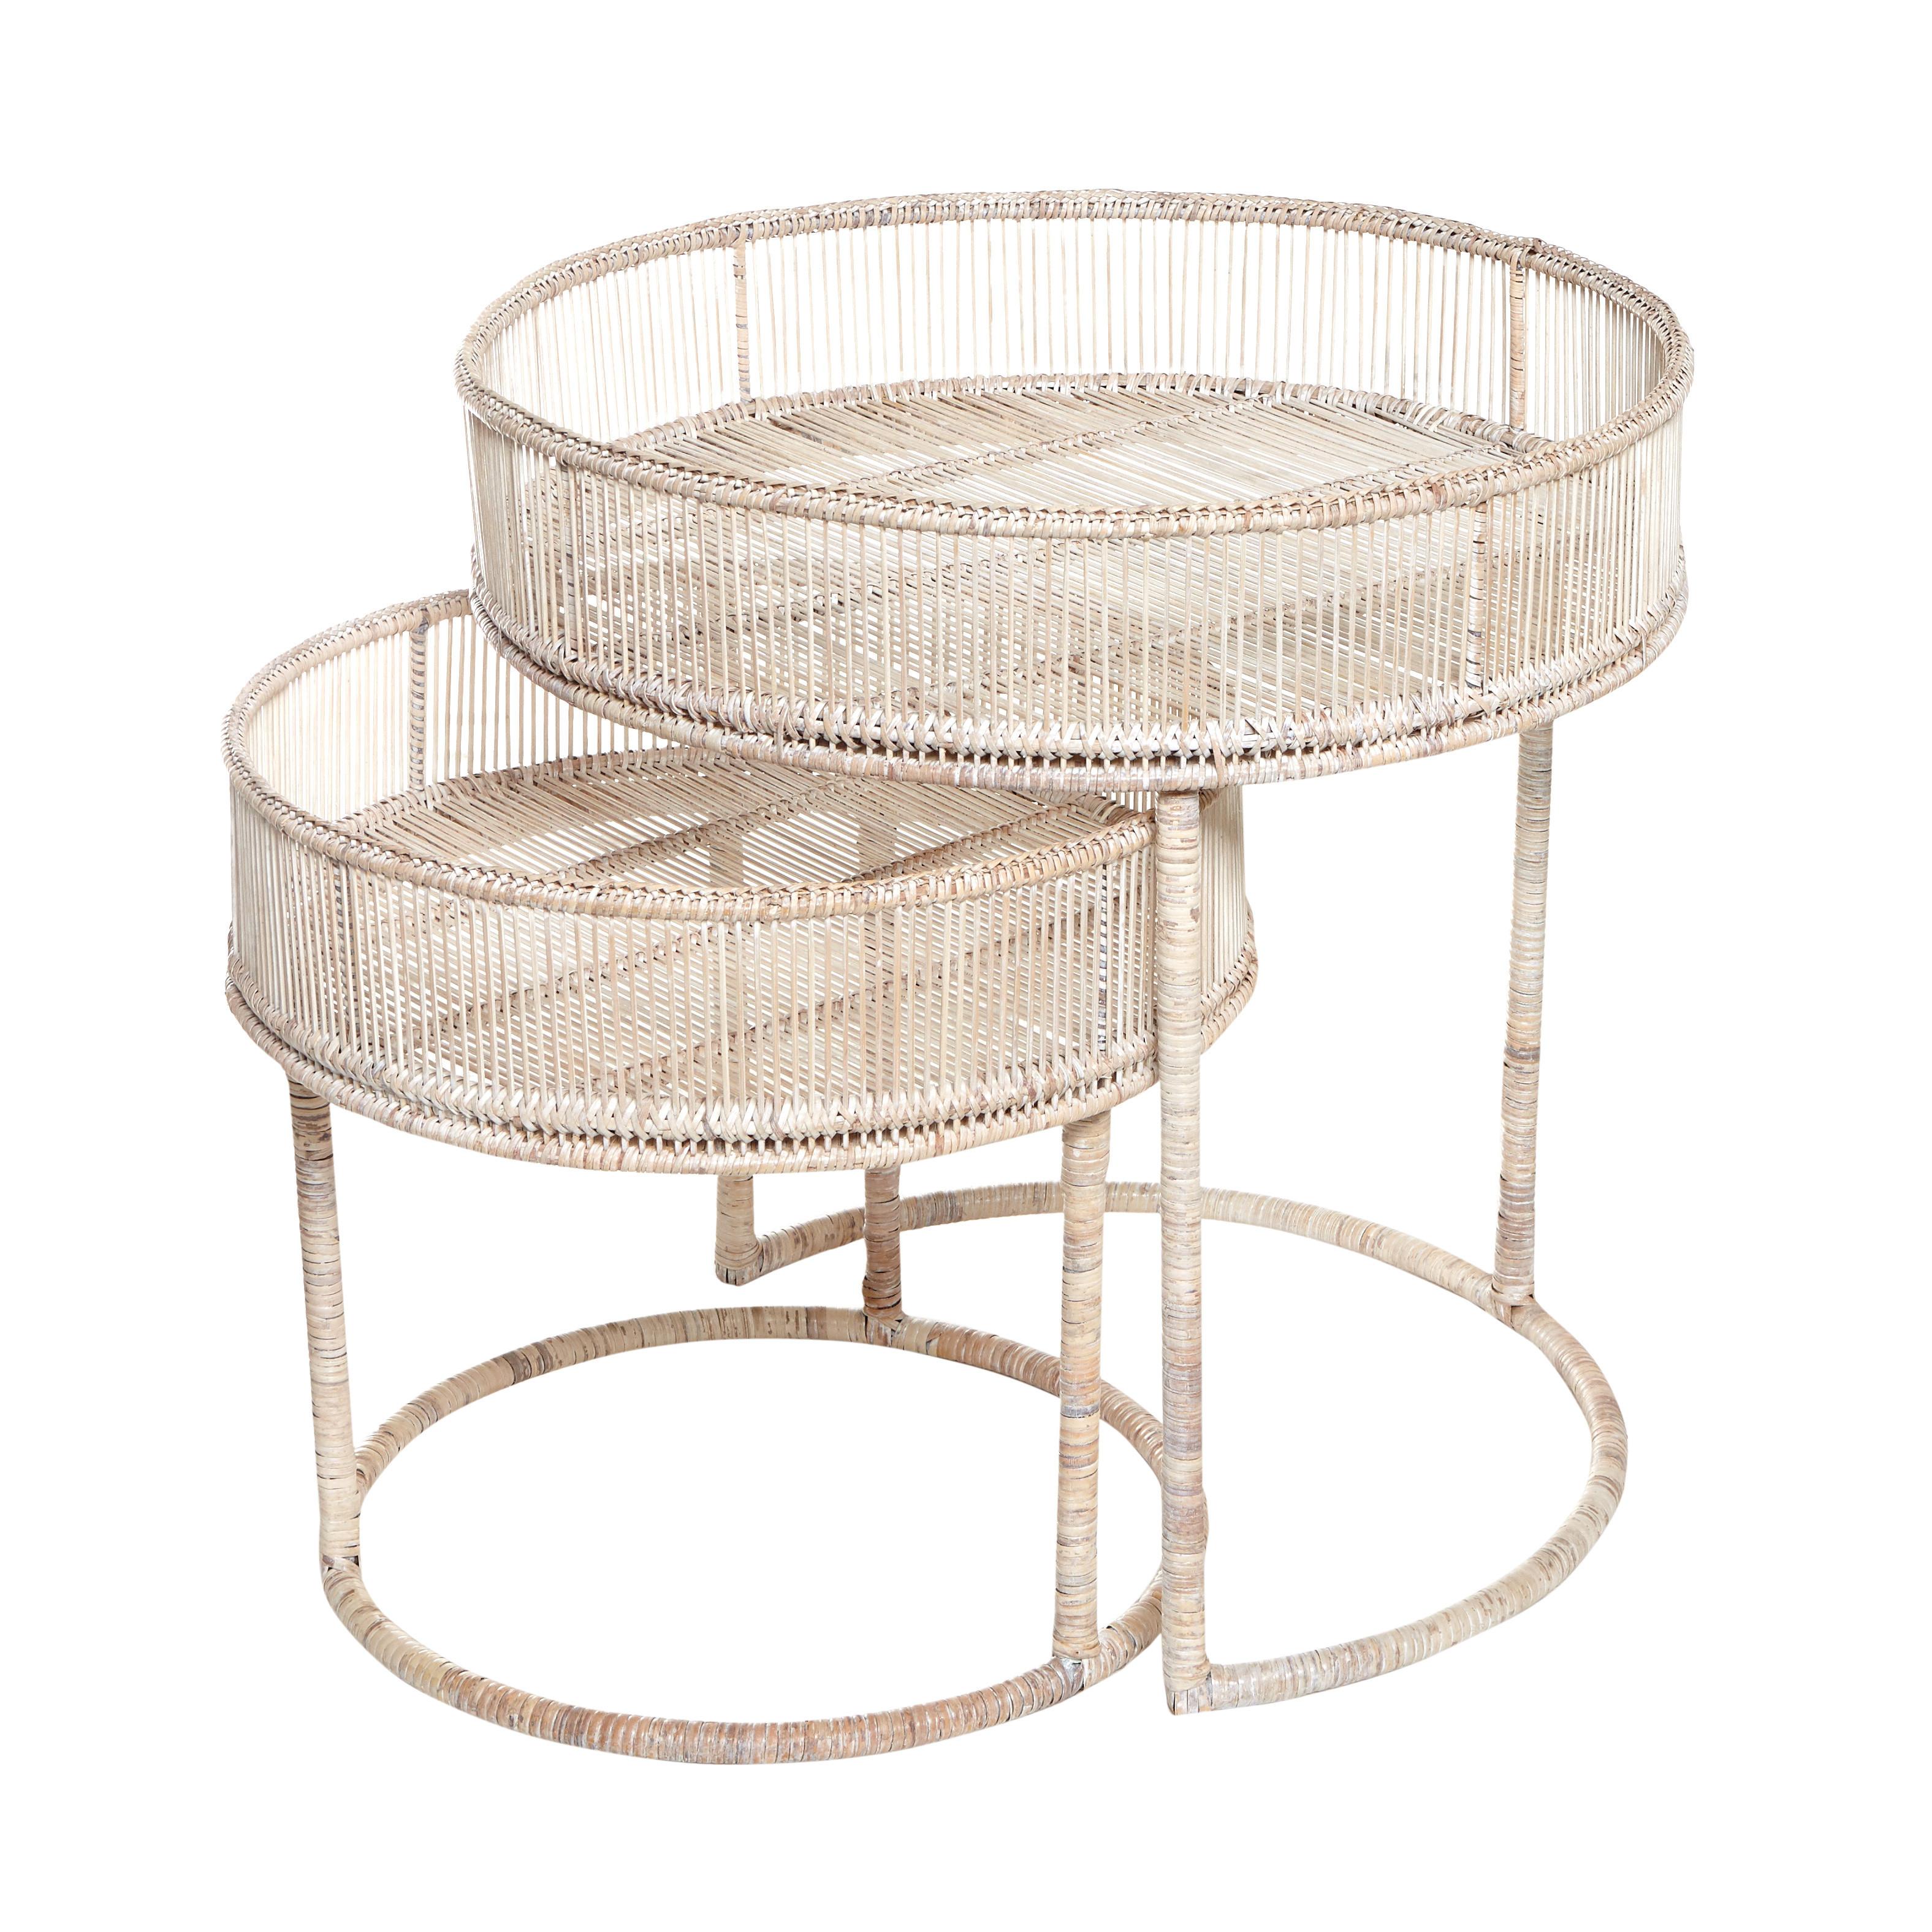 Set 2 tavolini rattan intrecciato a mano Ngwe, Naturale, large image number 0